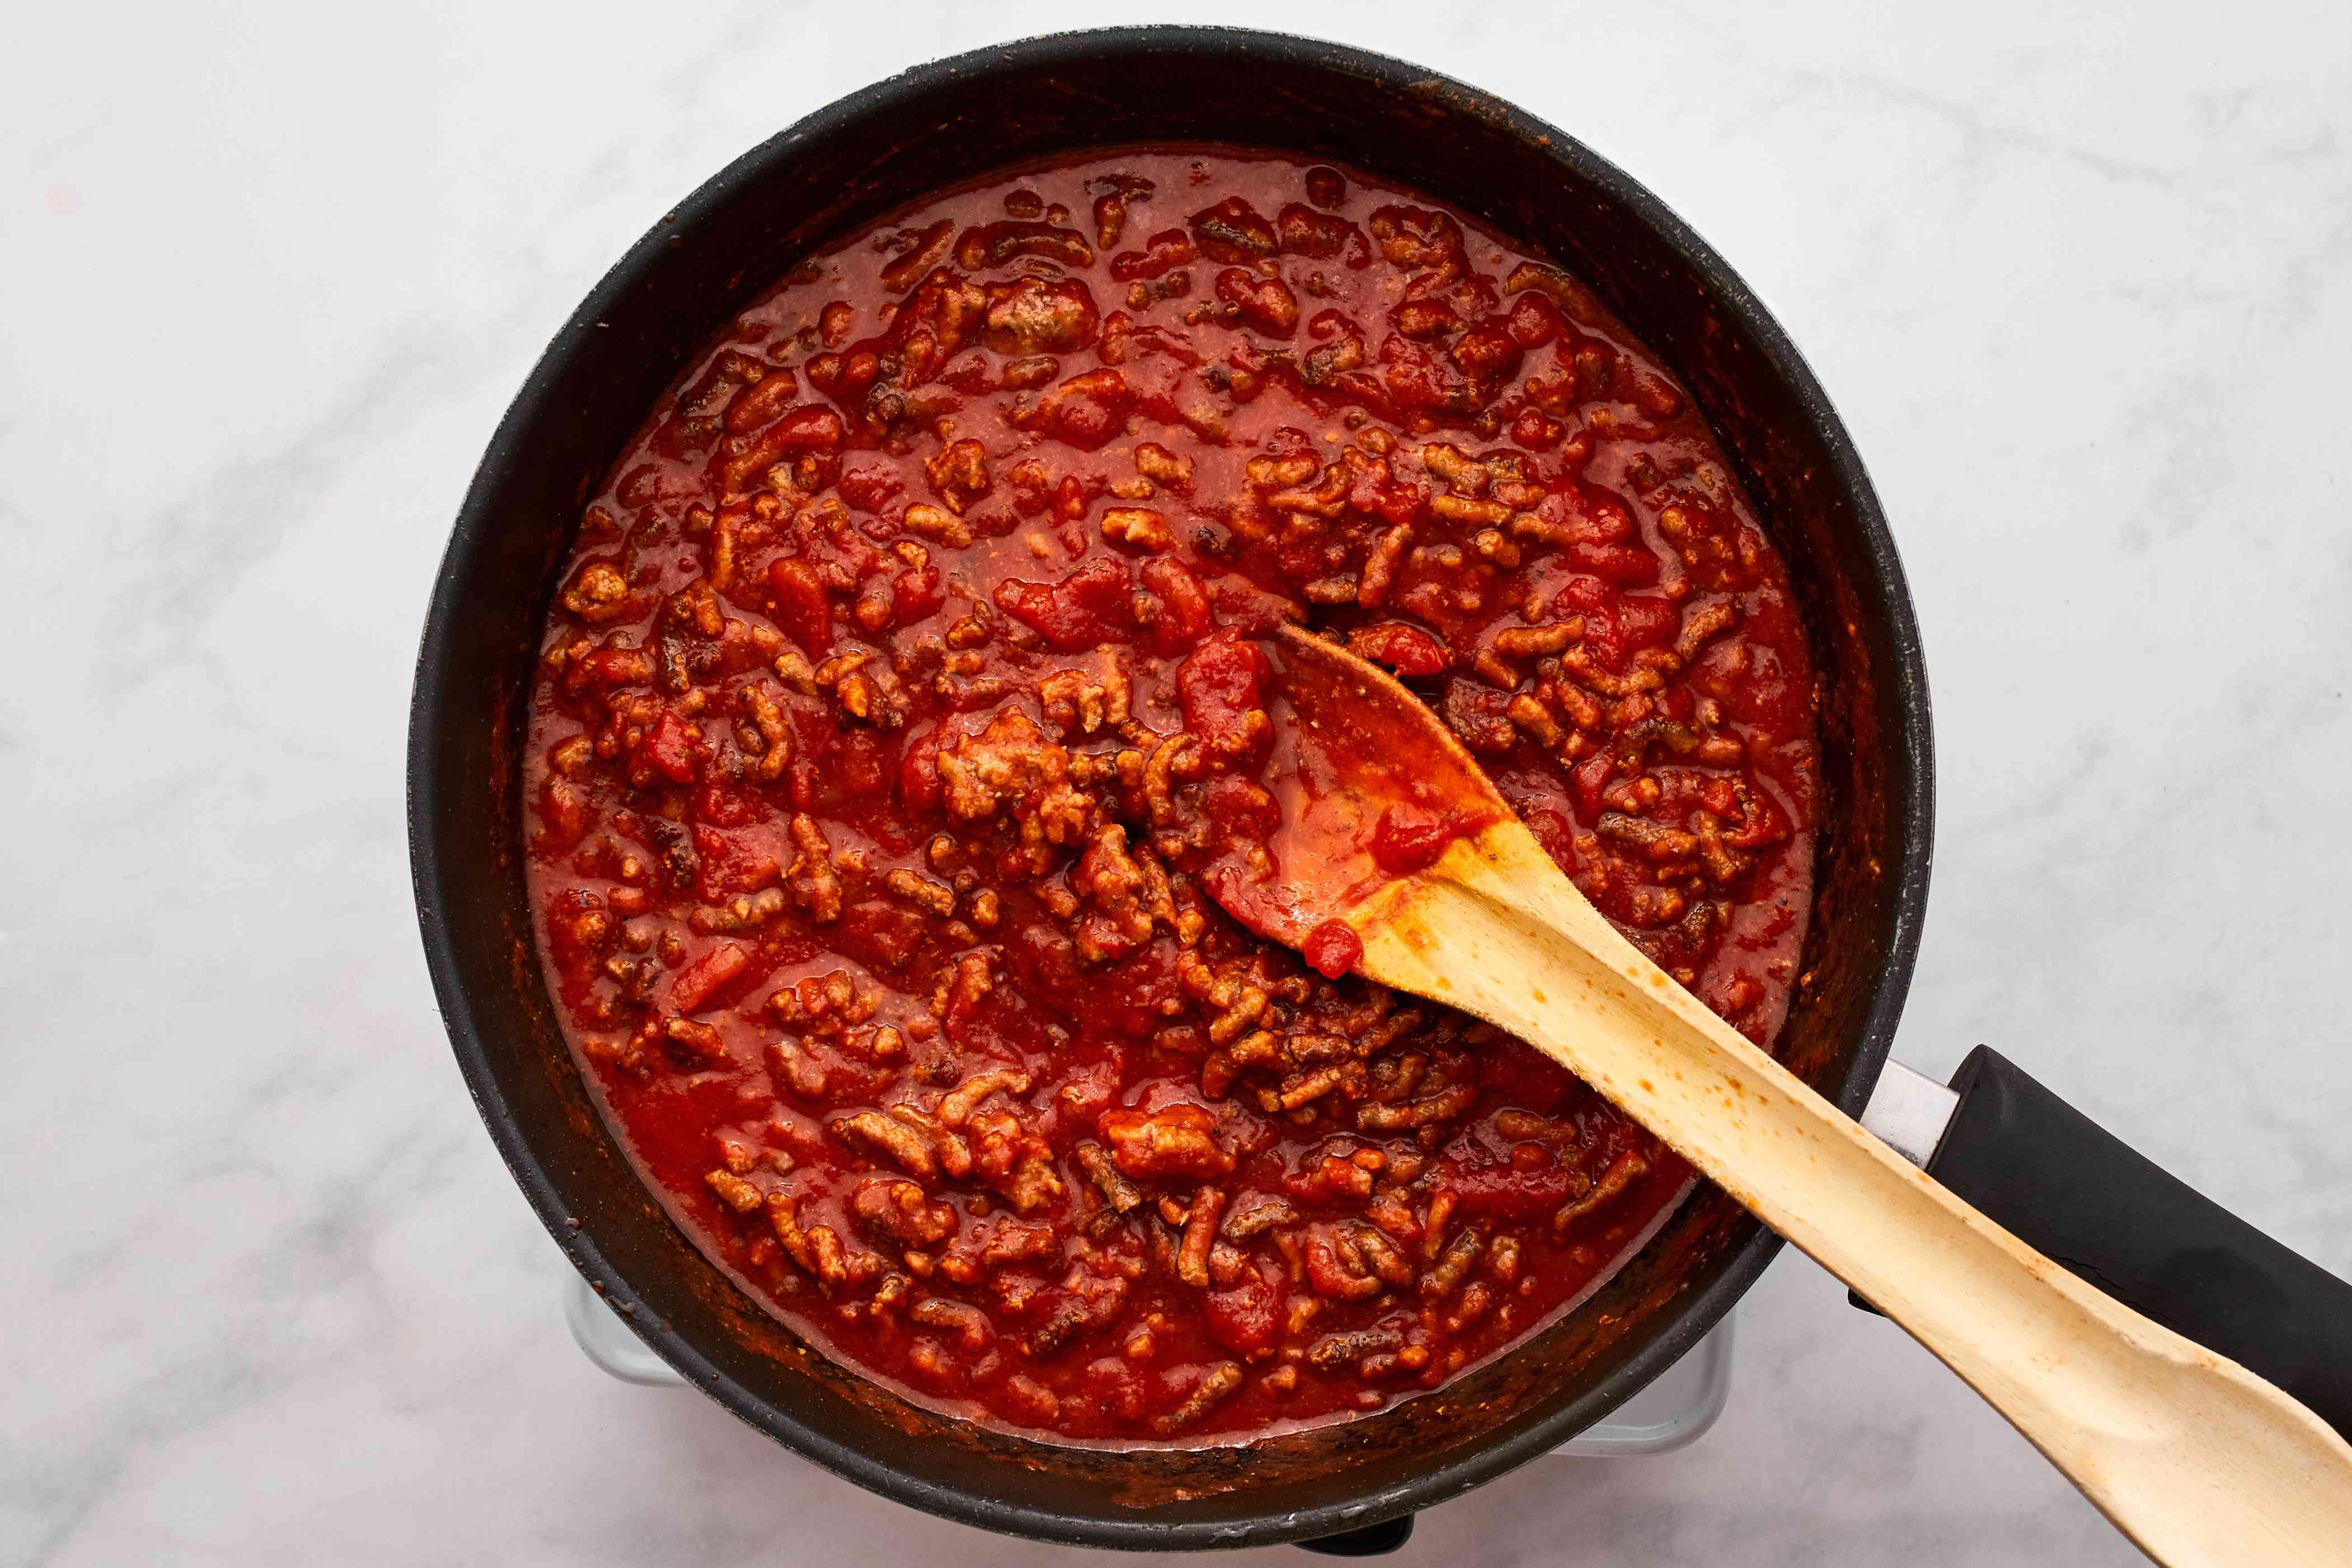 Add tomato sauce, garlic powder, 1/2 teaspoon salt, pepper, oregano, and cinnamon to the beef mixture